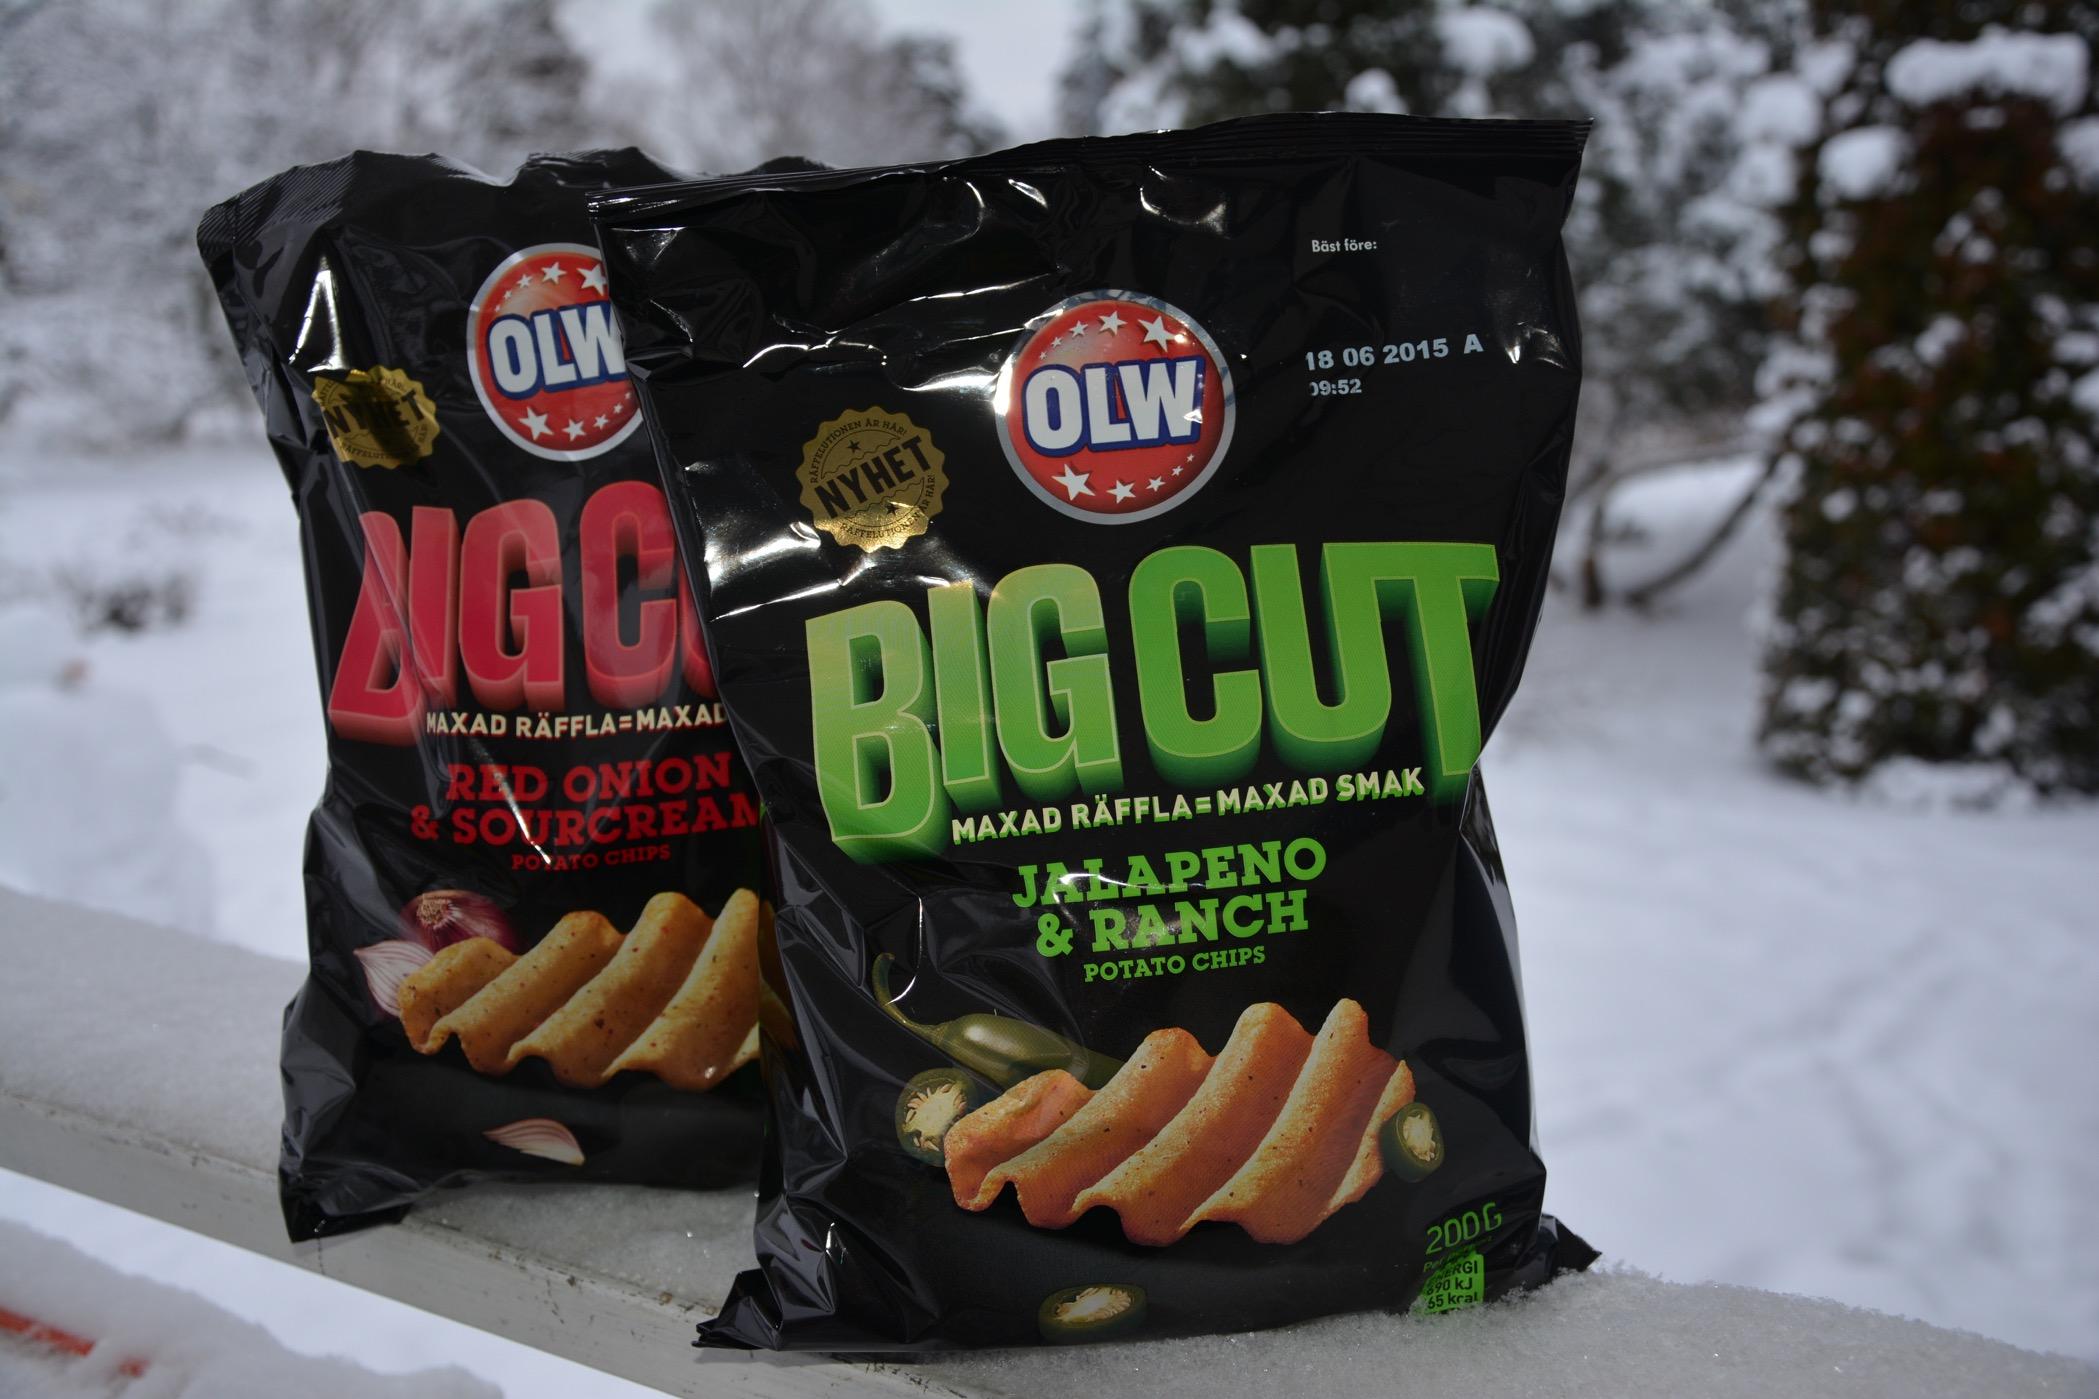 OLW Big Cut - nyhet i chipshyllan